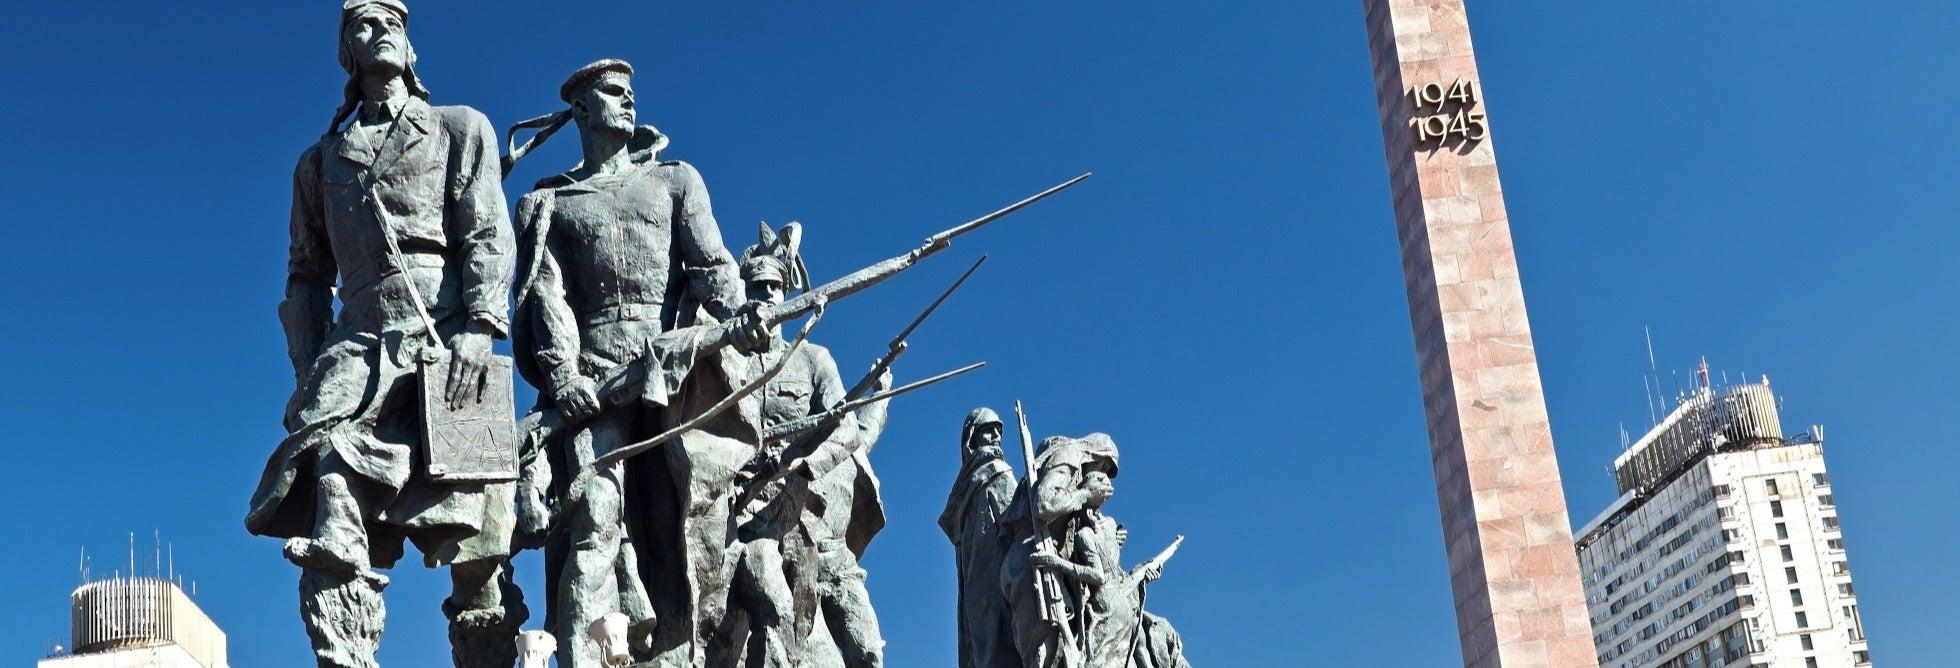 Tour del Sitio de Leningrado